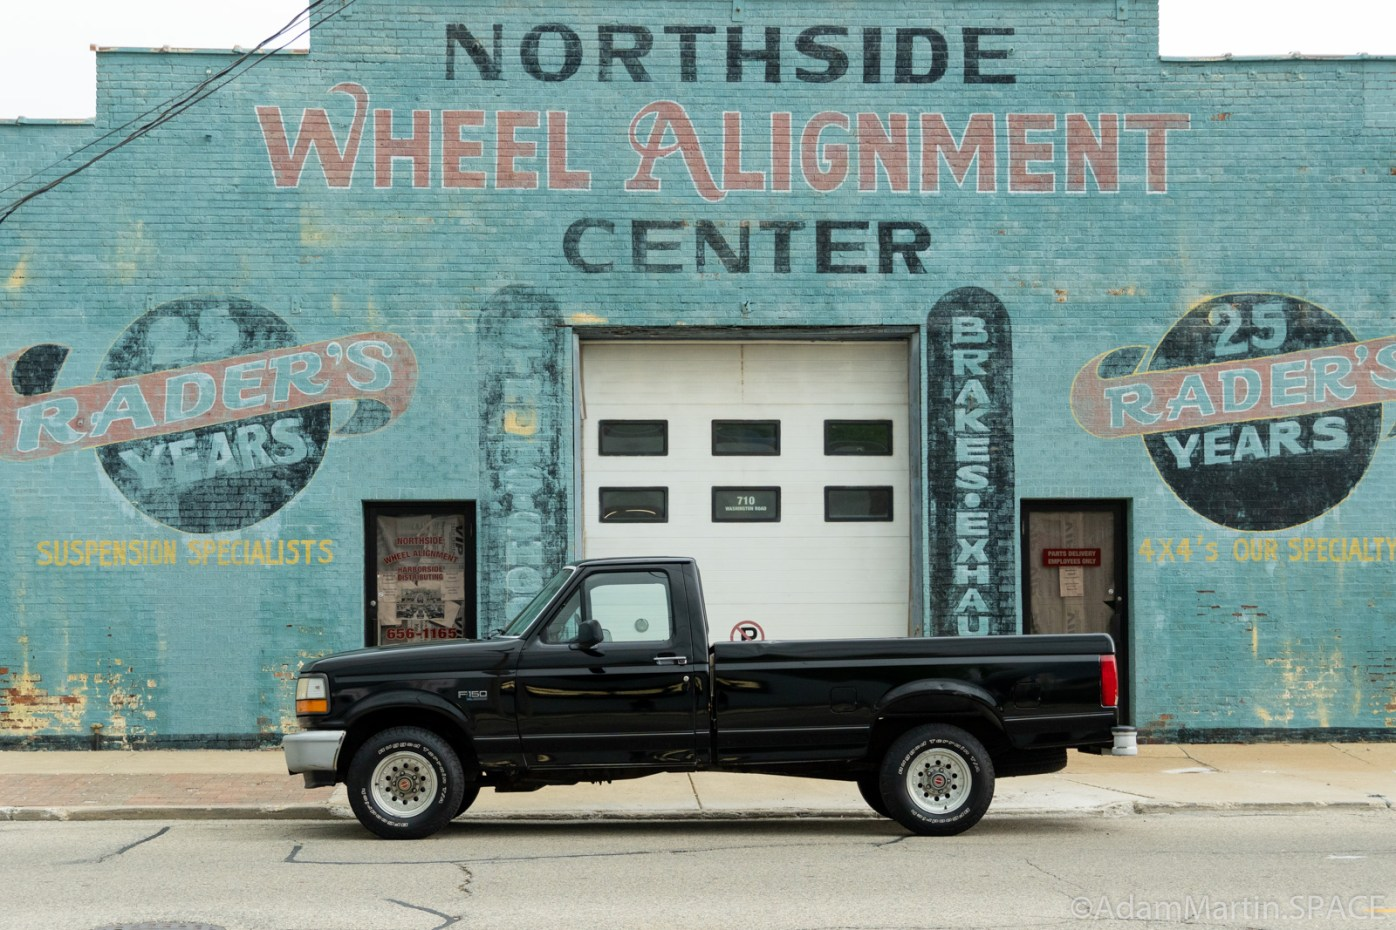 1994 F-150 at Northside Wheel Alignment